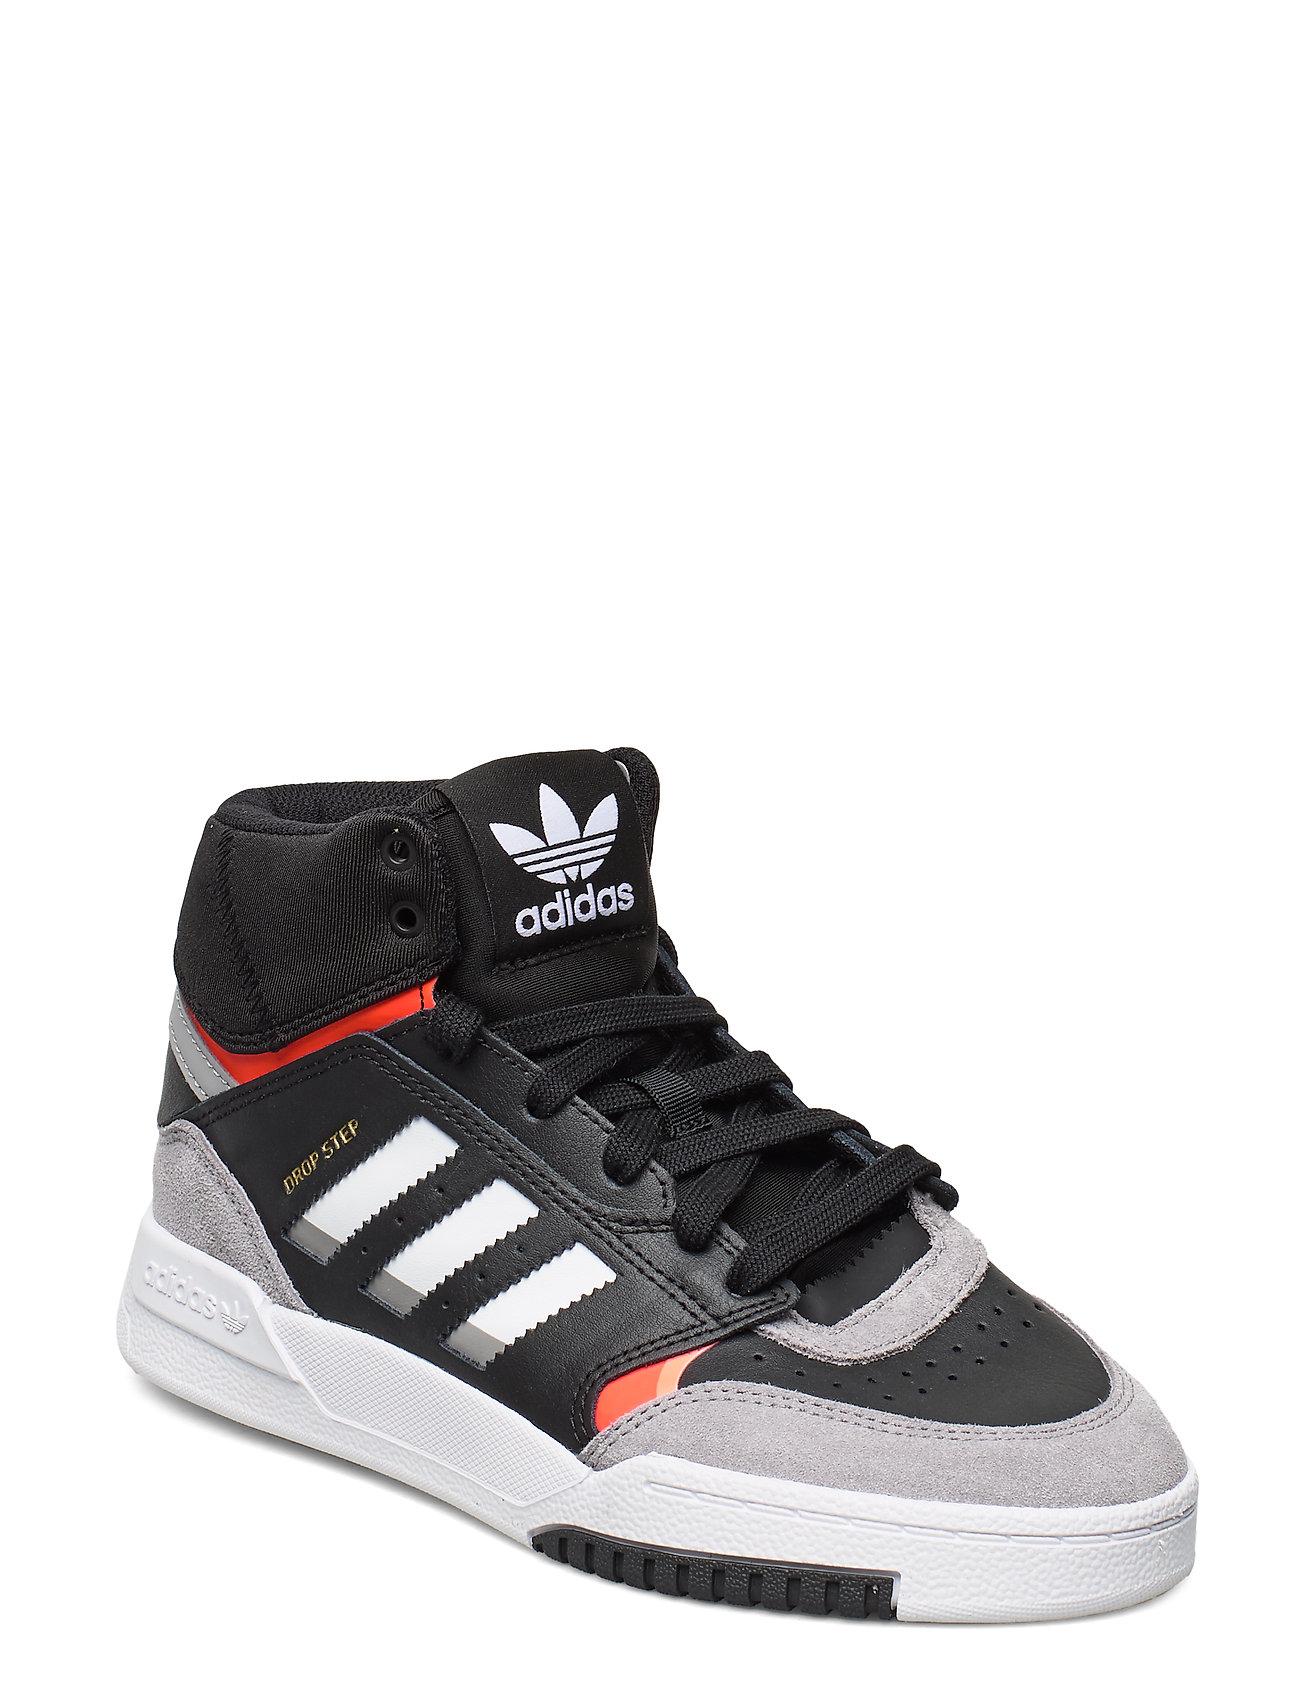 adidas Originals DROP STEP J - CBLACK/LGRANI/SOLRED